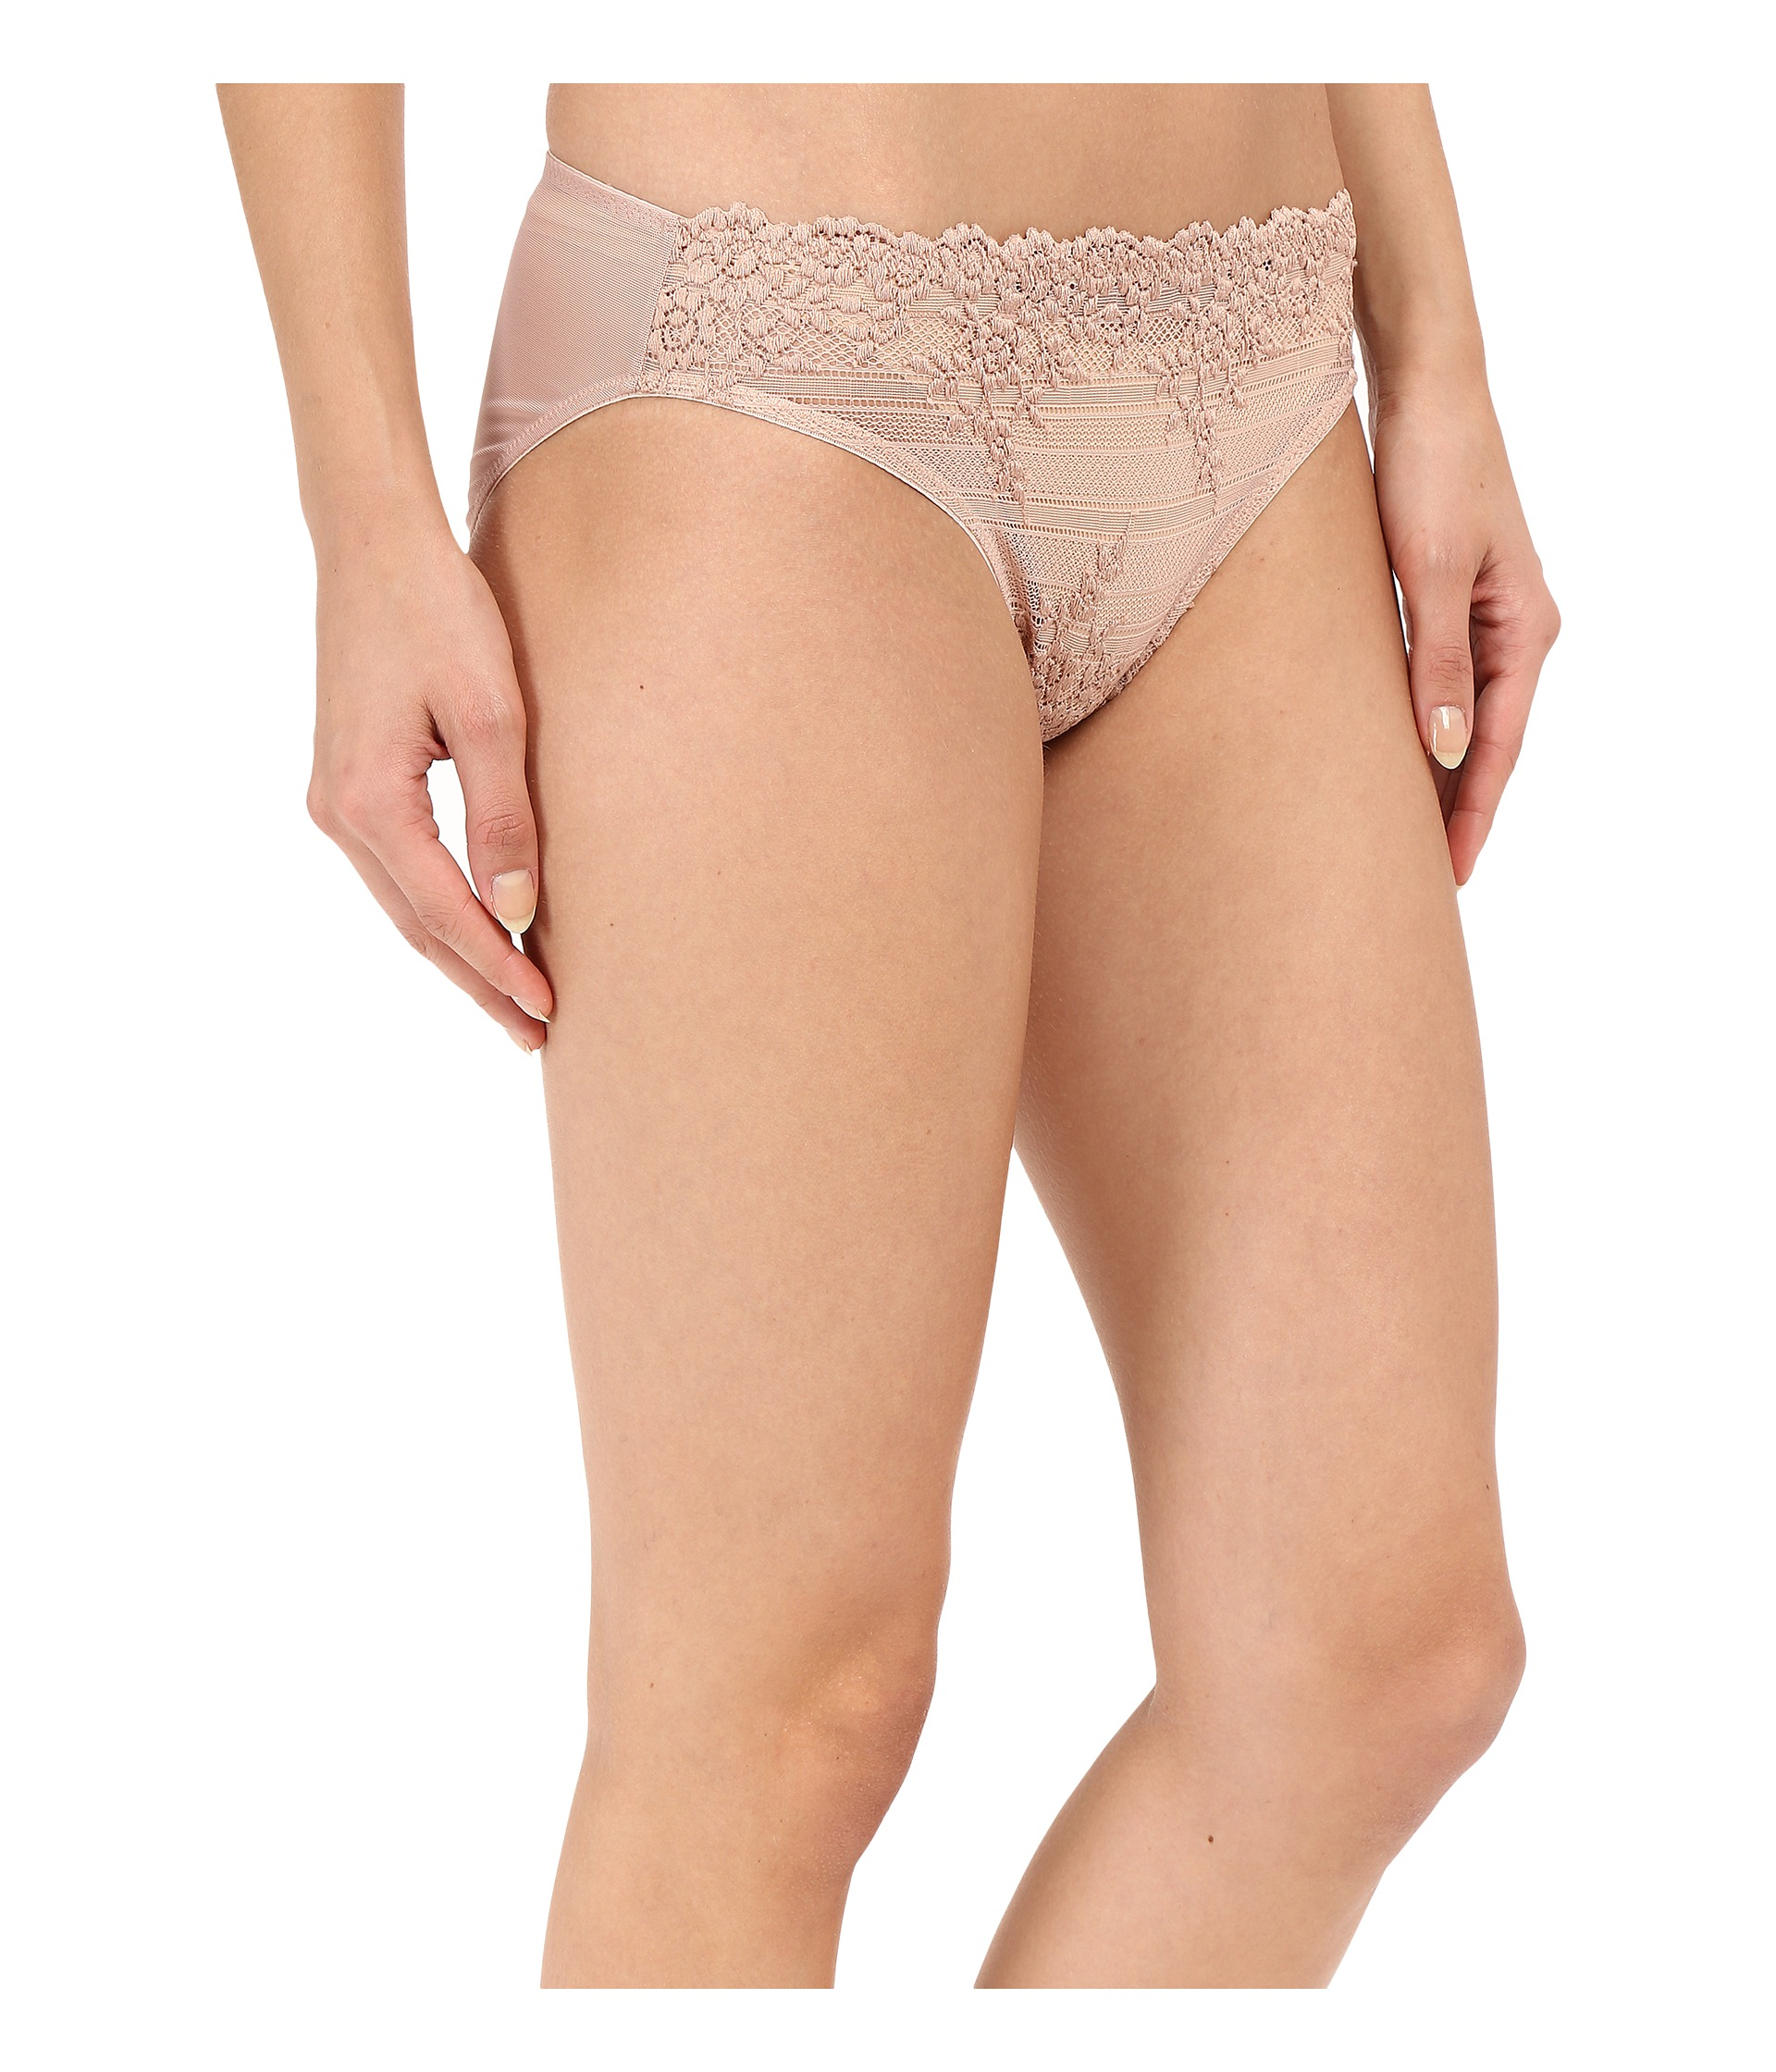 embrace lace bikini jpg 1152x768